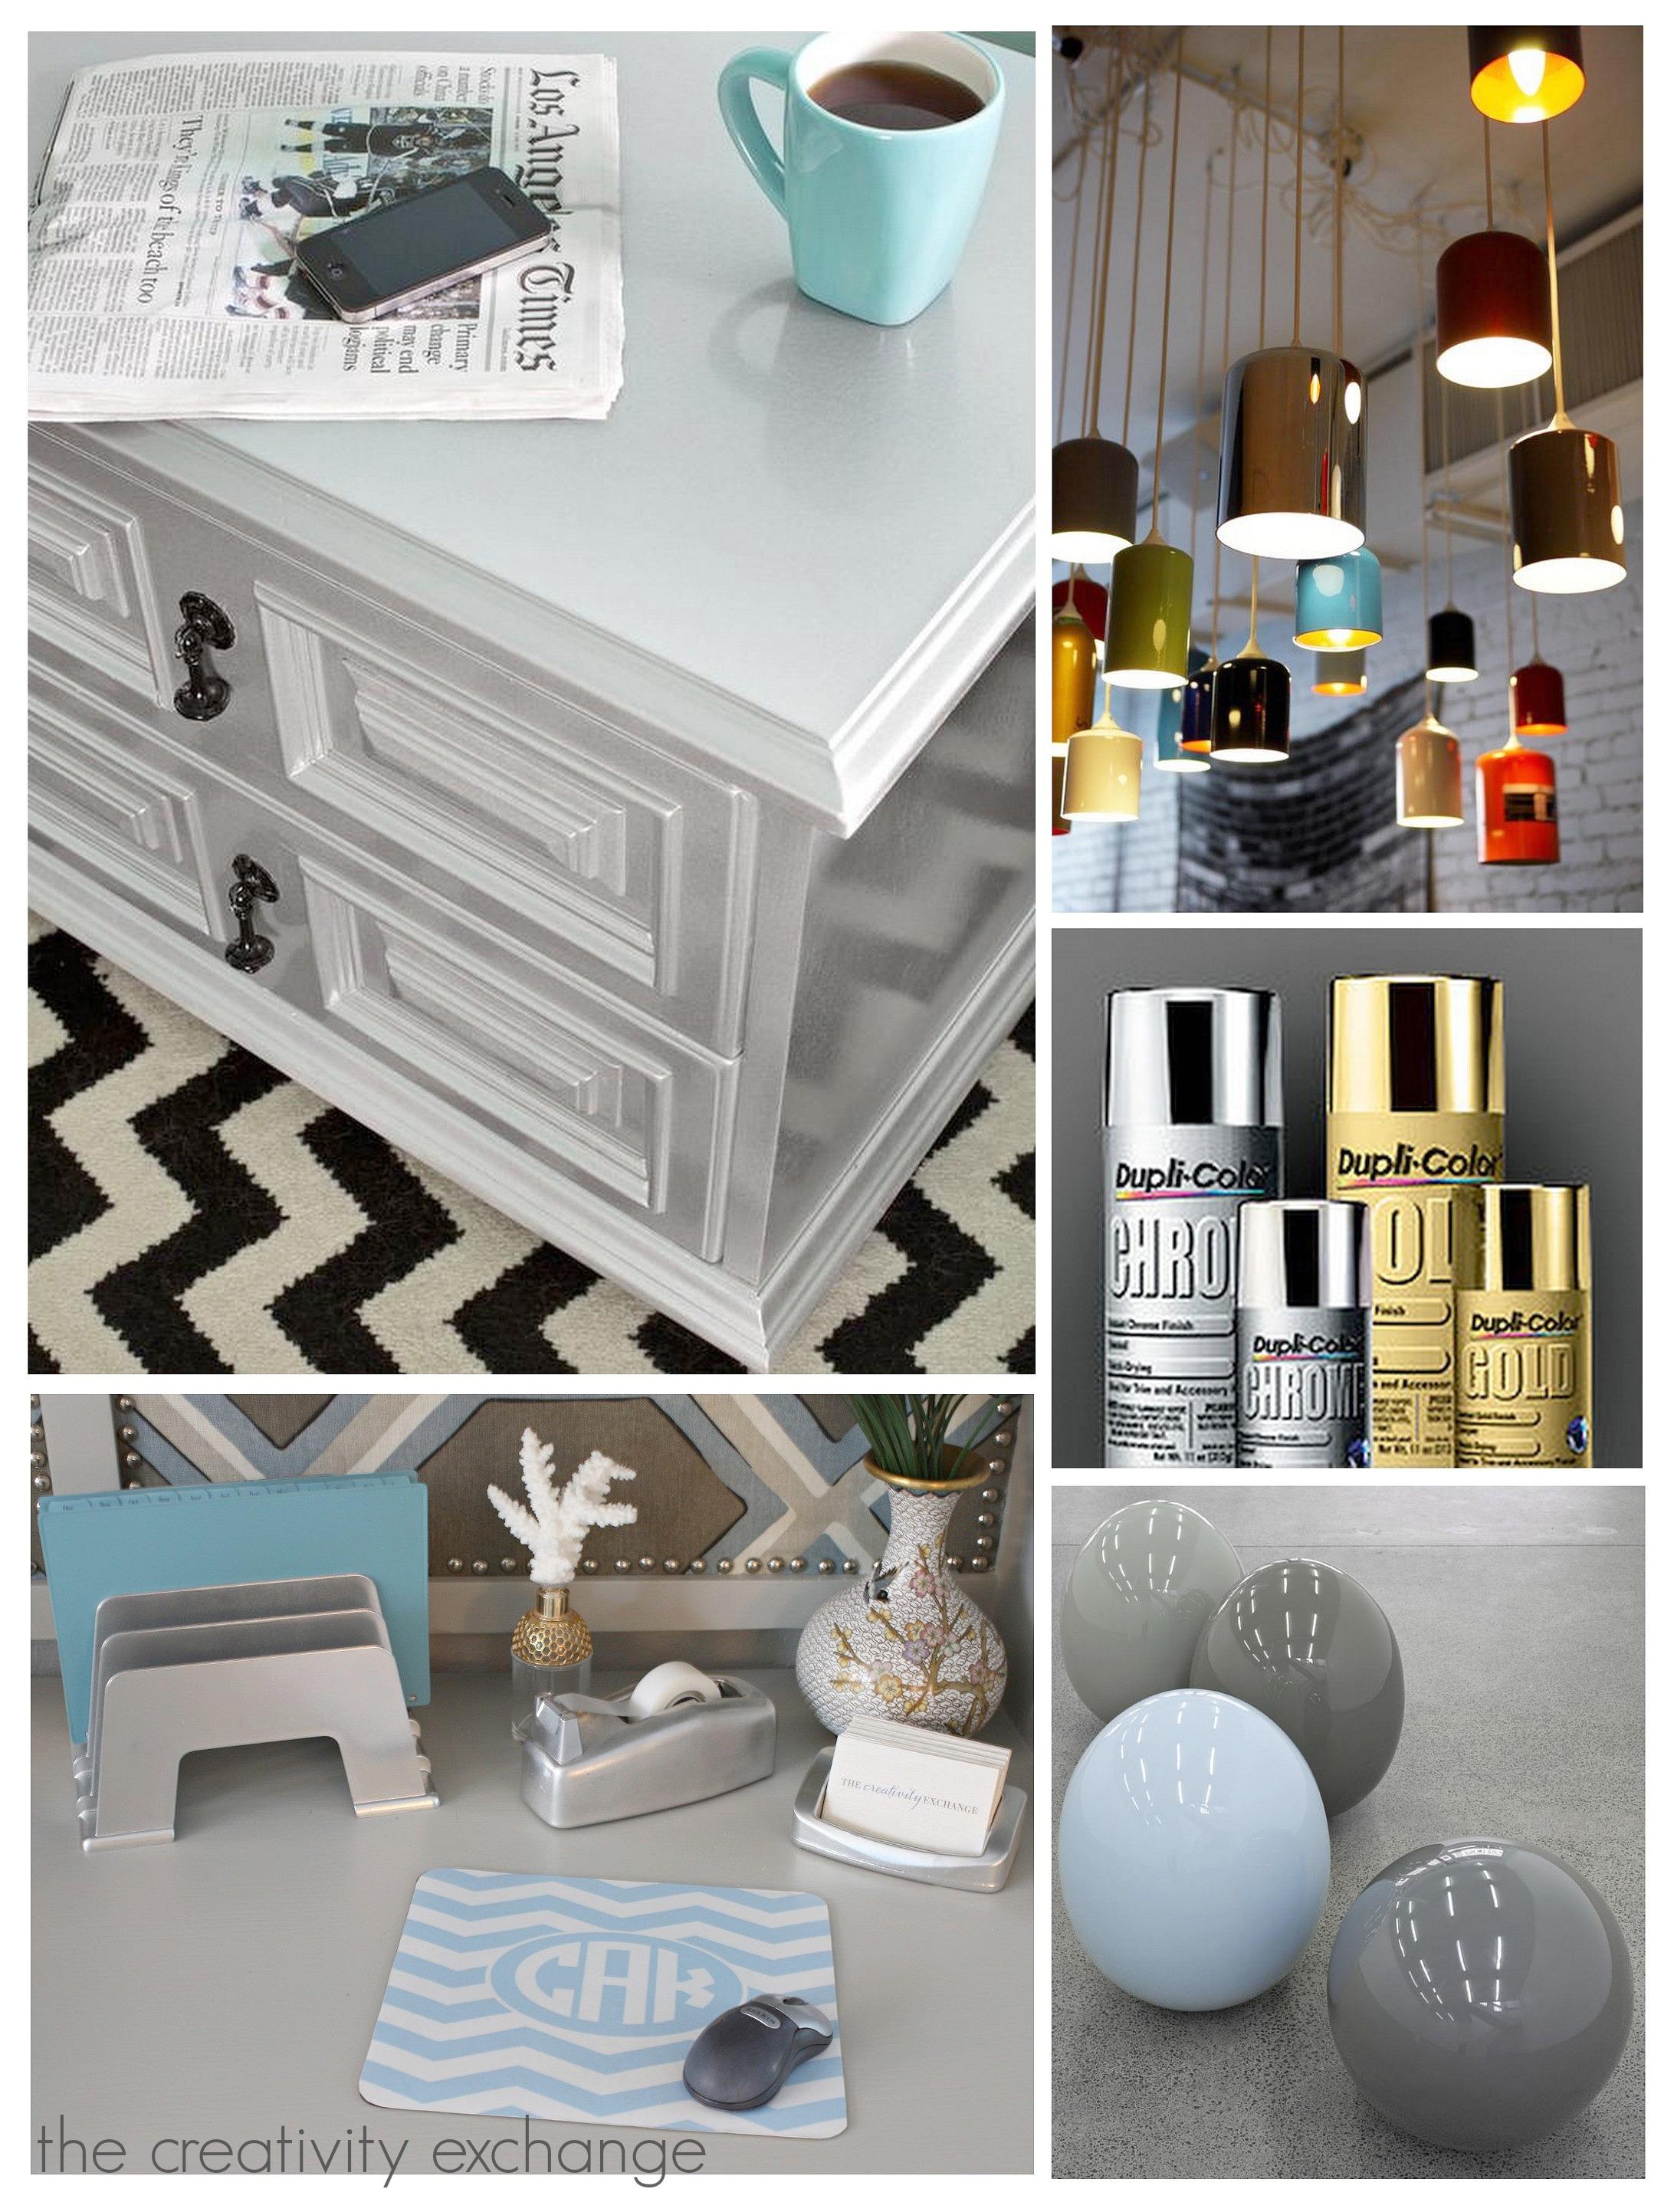 Dying Light Spray Paint : dying, light, spray, paint, Automotive, Spray, Paint, Fixtures, Furniture